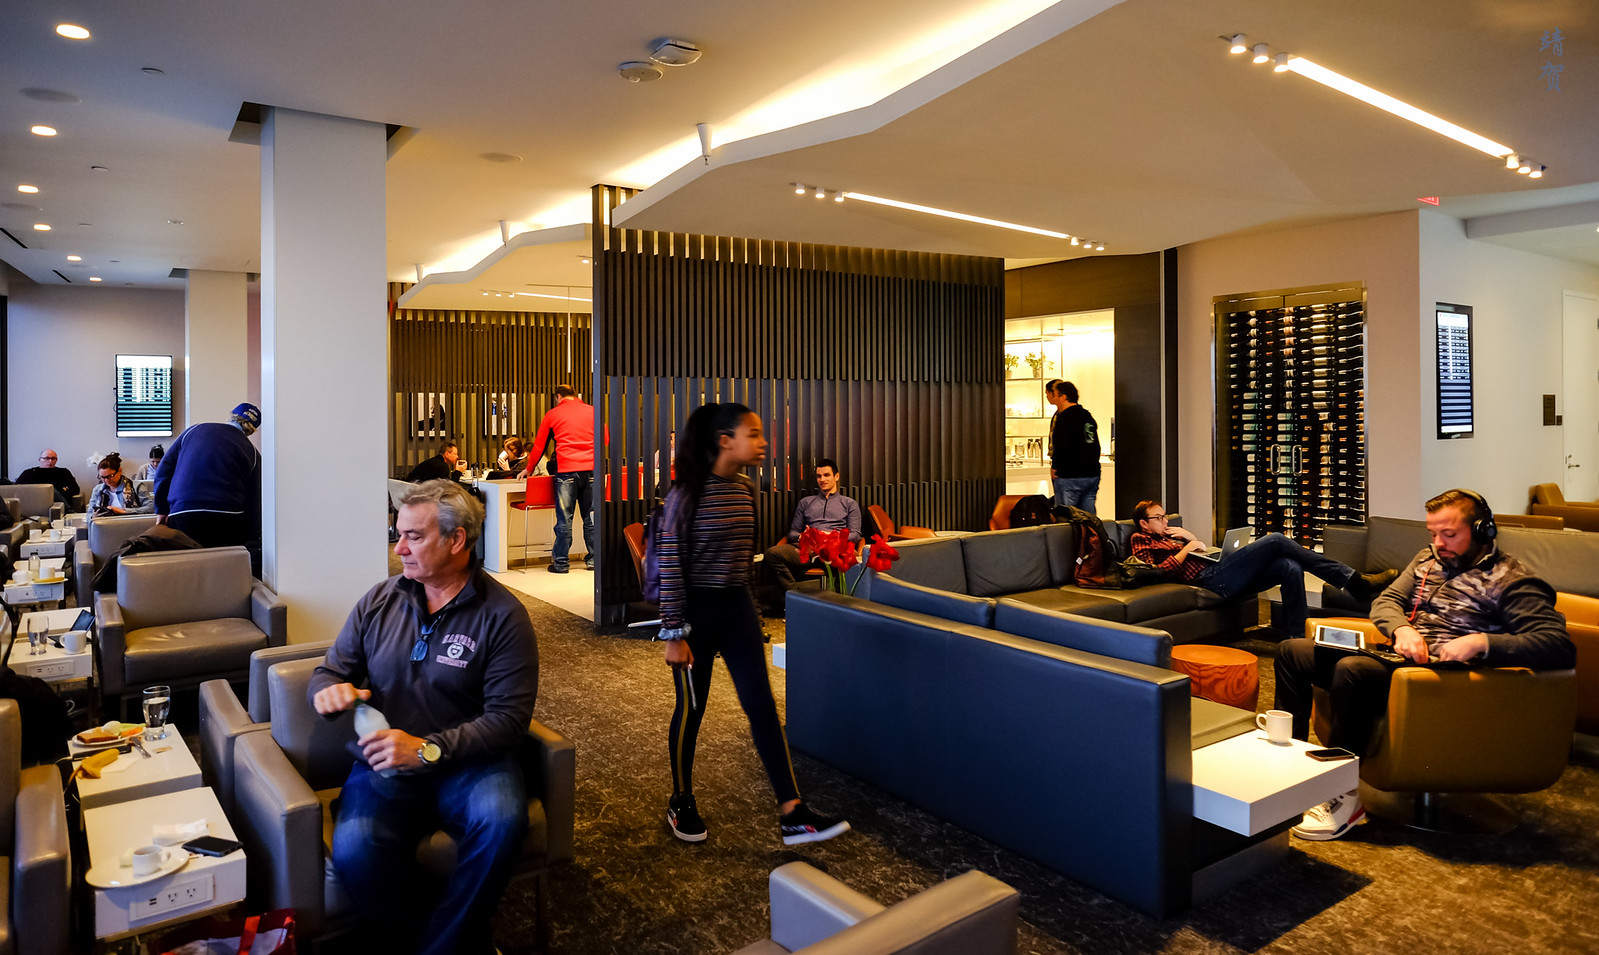 Inside the lounge